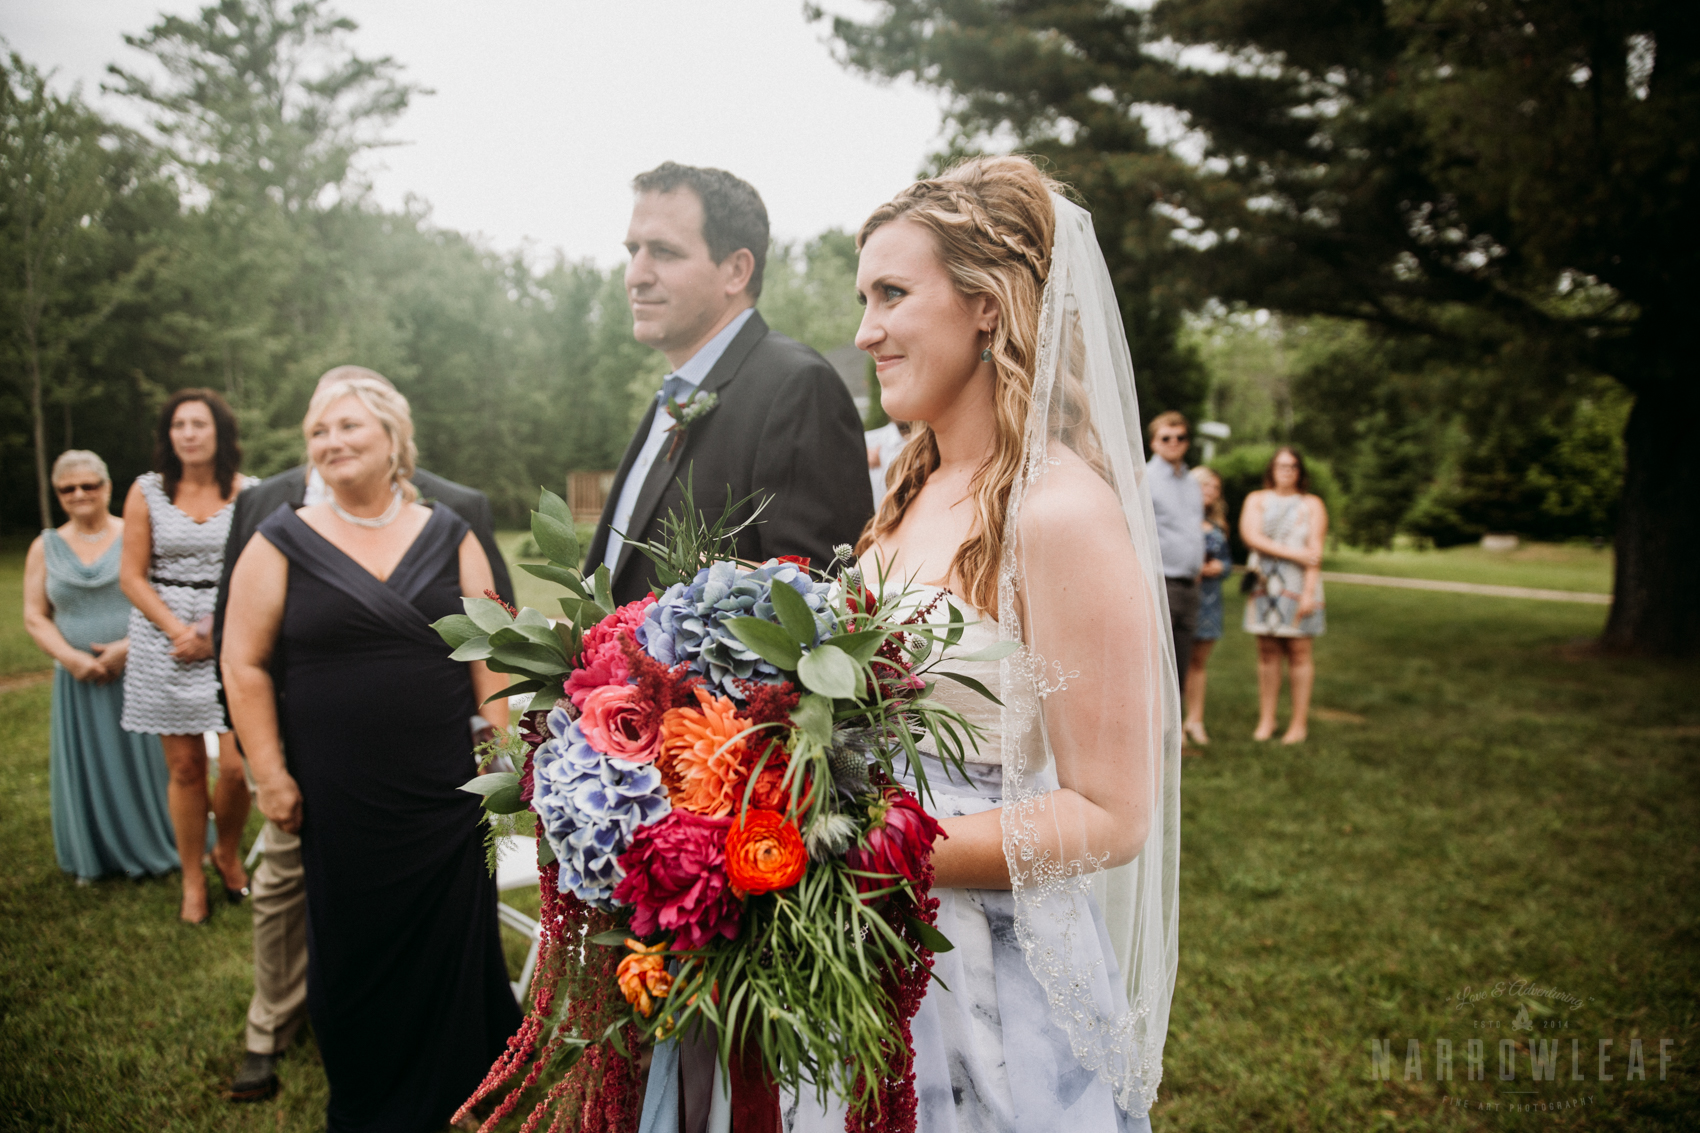 bayfield-wi-lake-superior-beach-wedding-ceremony-12.jpg